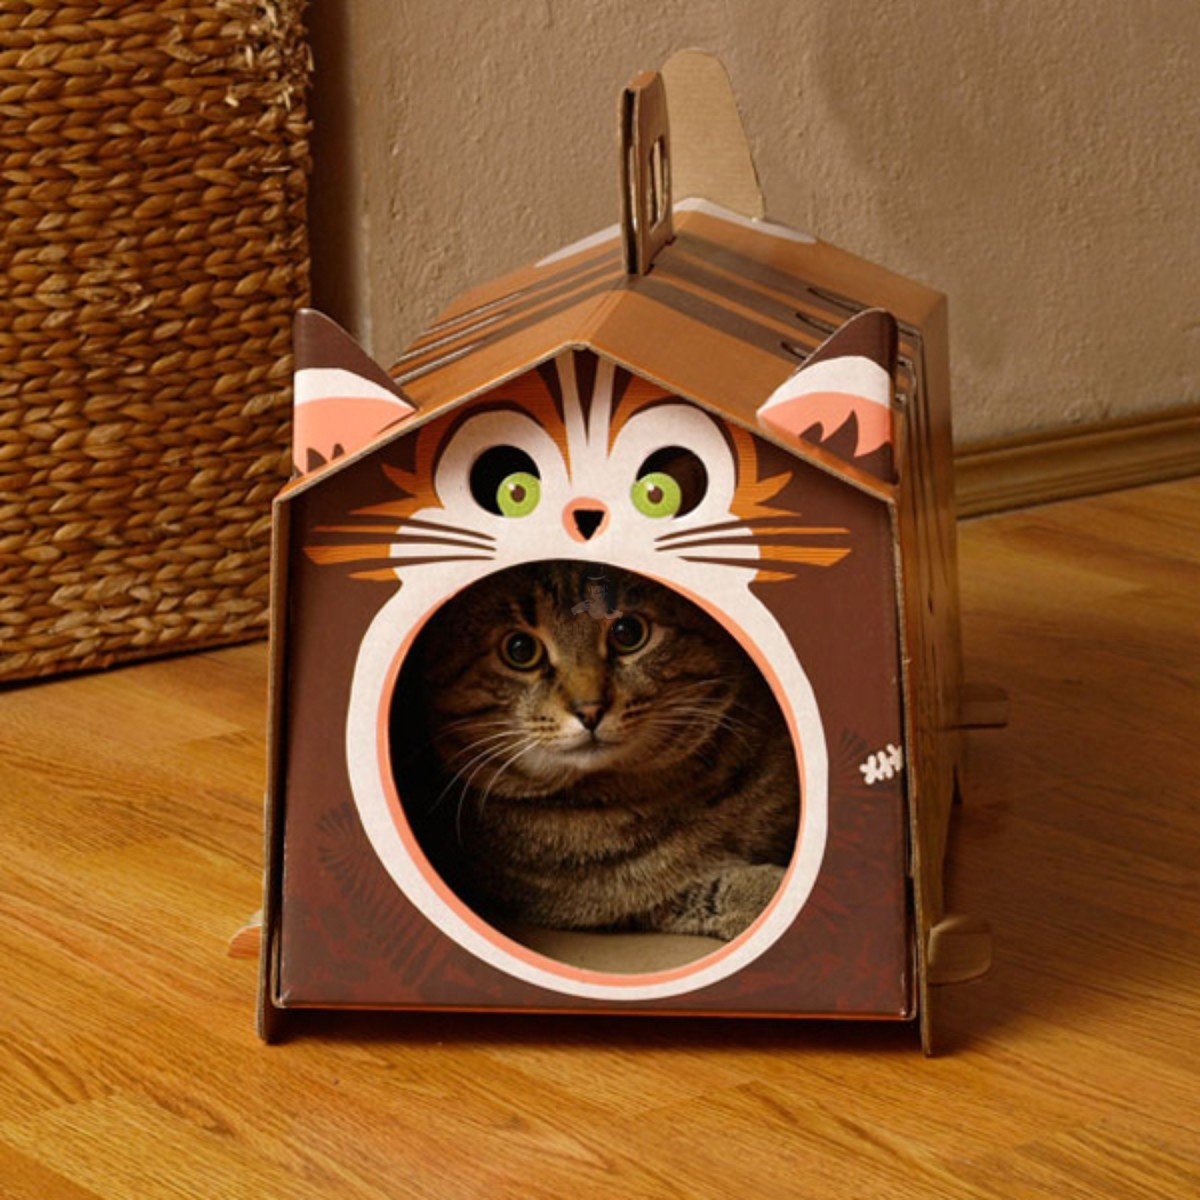 Домик котенку из картонных коробок